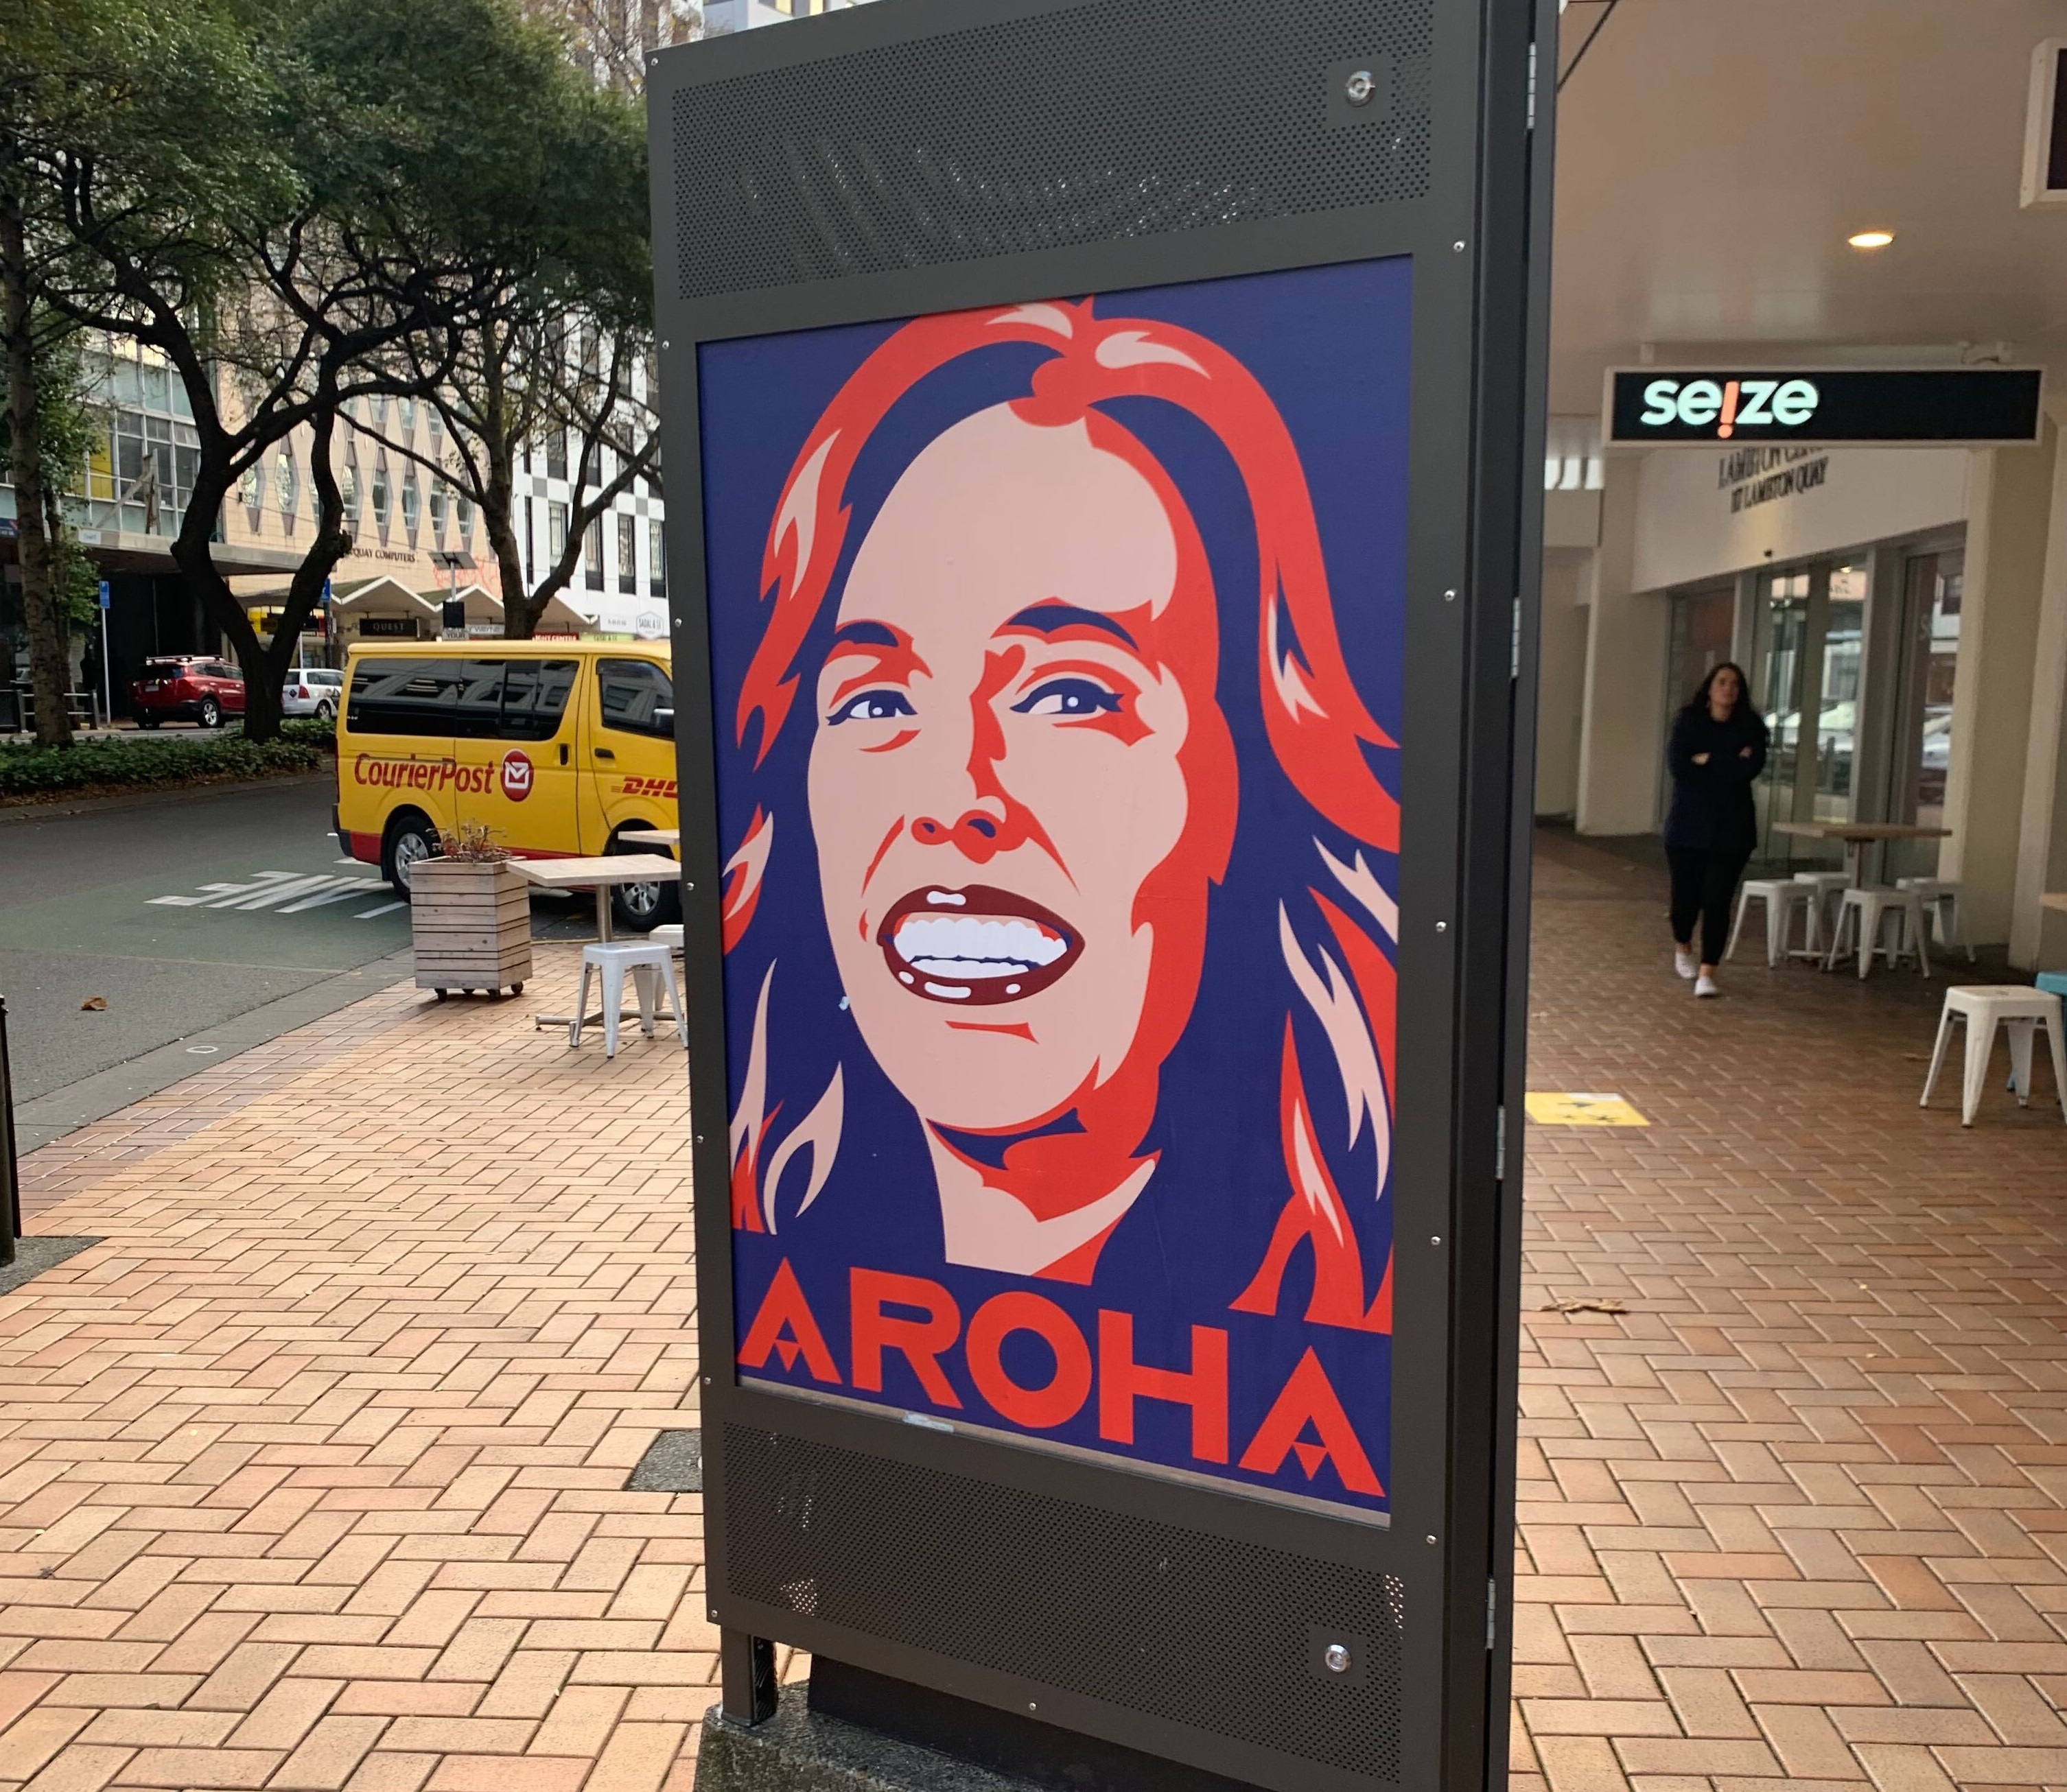 Aroha poster